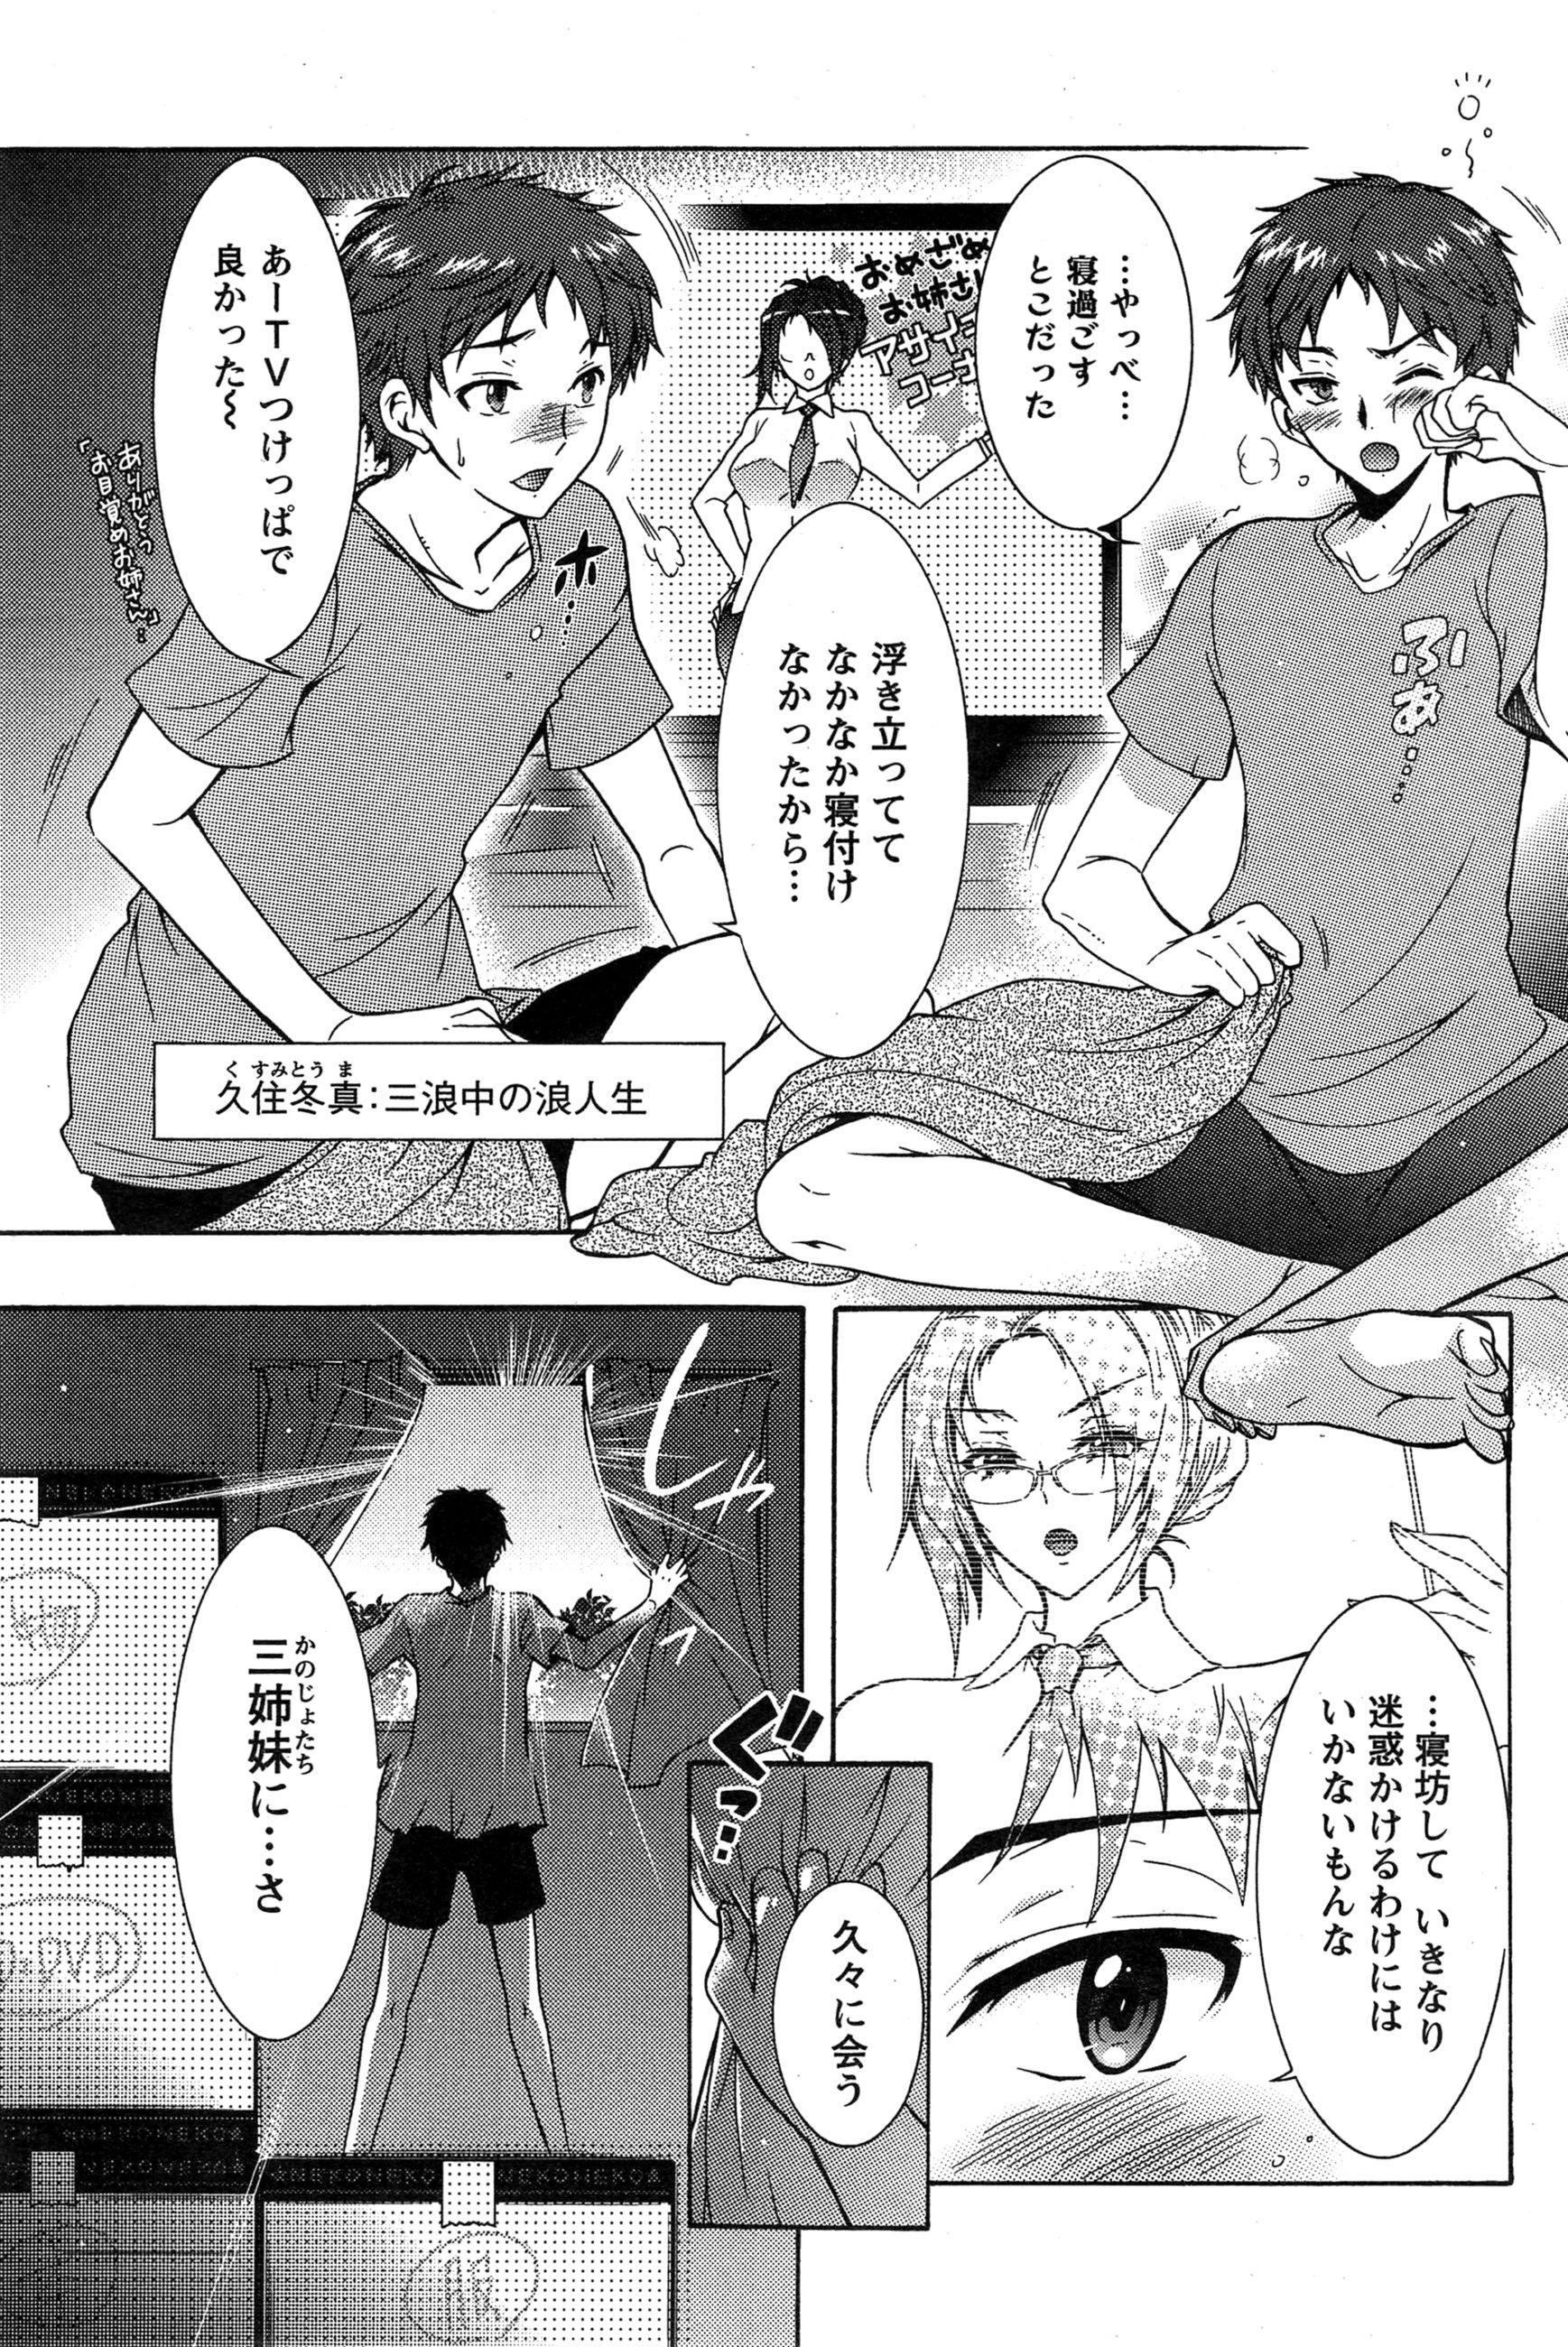 [Honda Arima] Sanshimai no Omocha - The Slave of Three Sisters Ch. 1-6 3